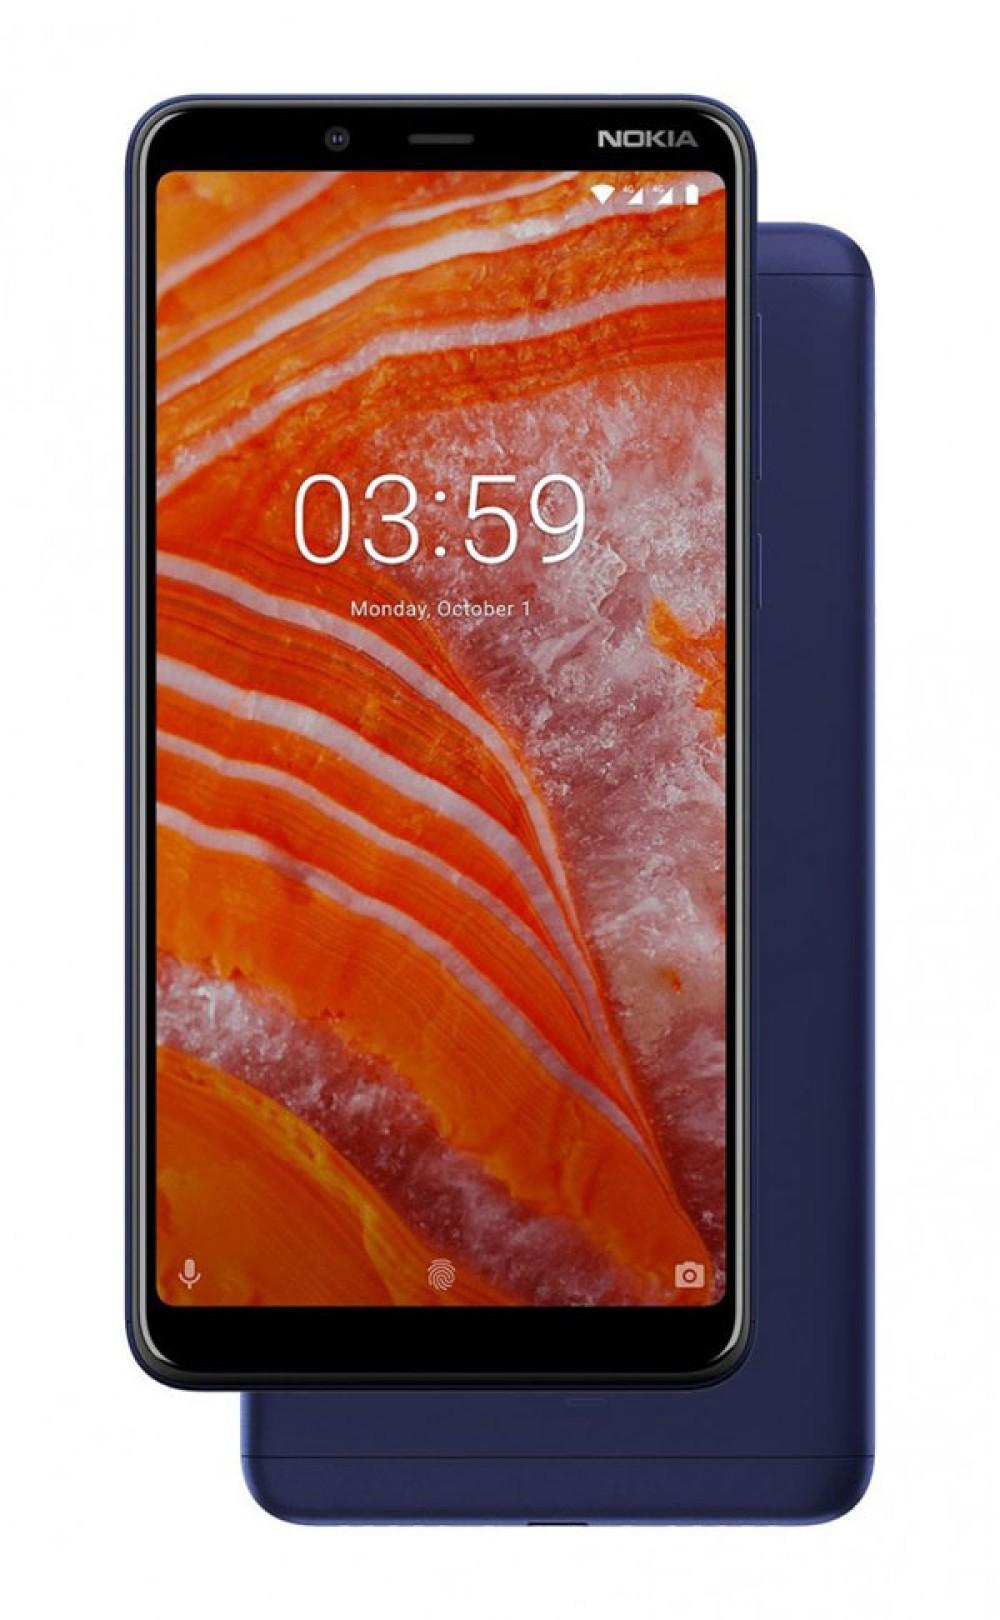 Nokia 3.1 Plus: Επίσημα με οθόνη 6.0'' HD+, dual κάμερα και τιμή μικρότερη από €150 [Video]